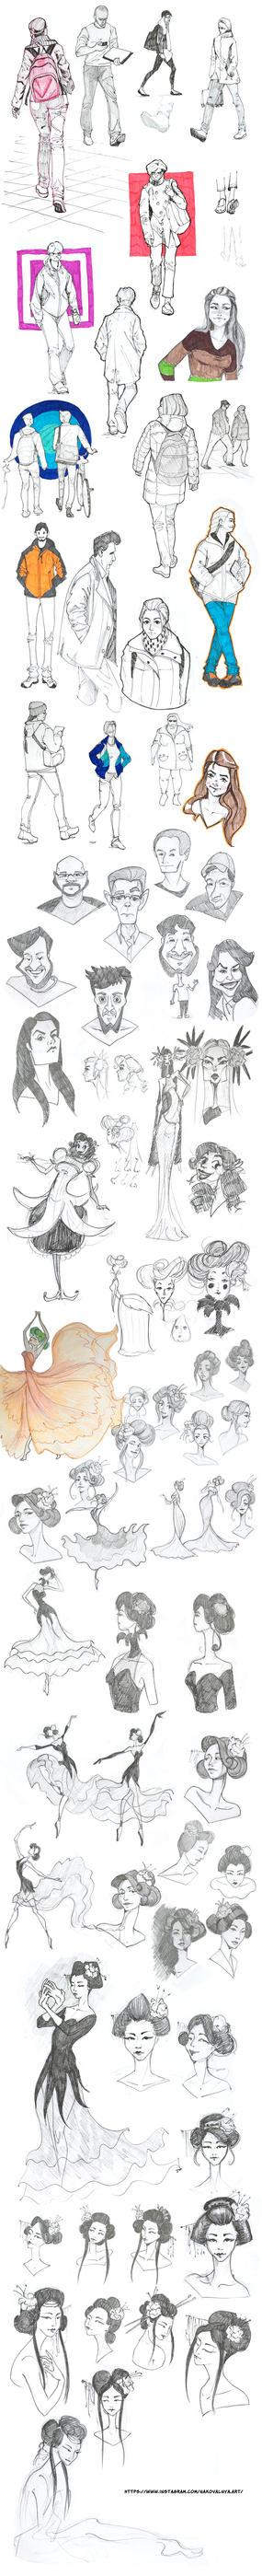 Sketch Dump #12 by nakovalnya-artist